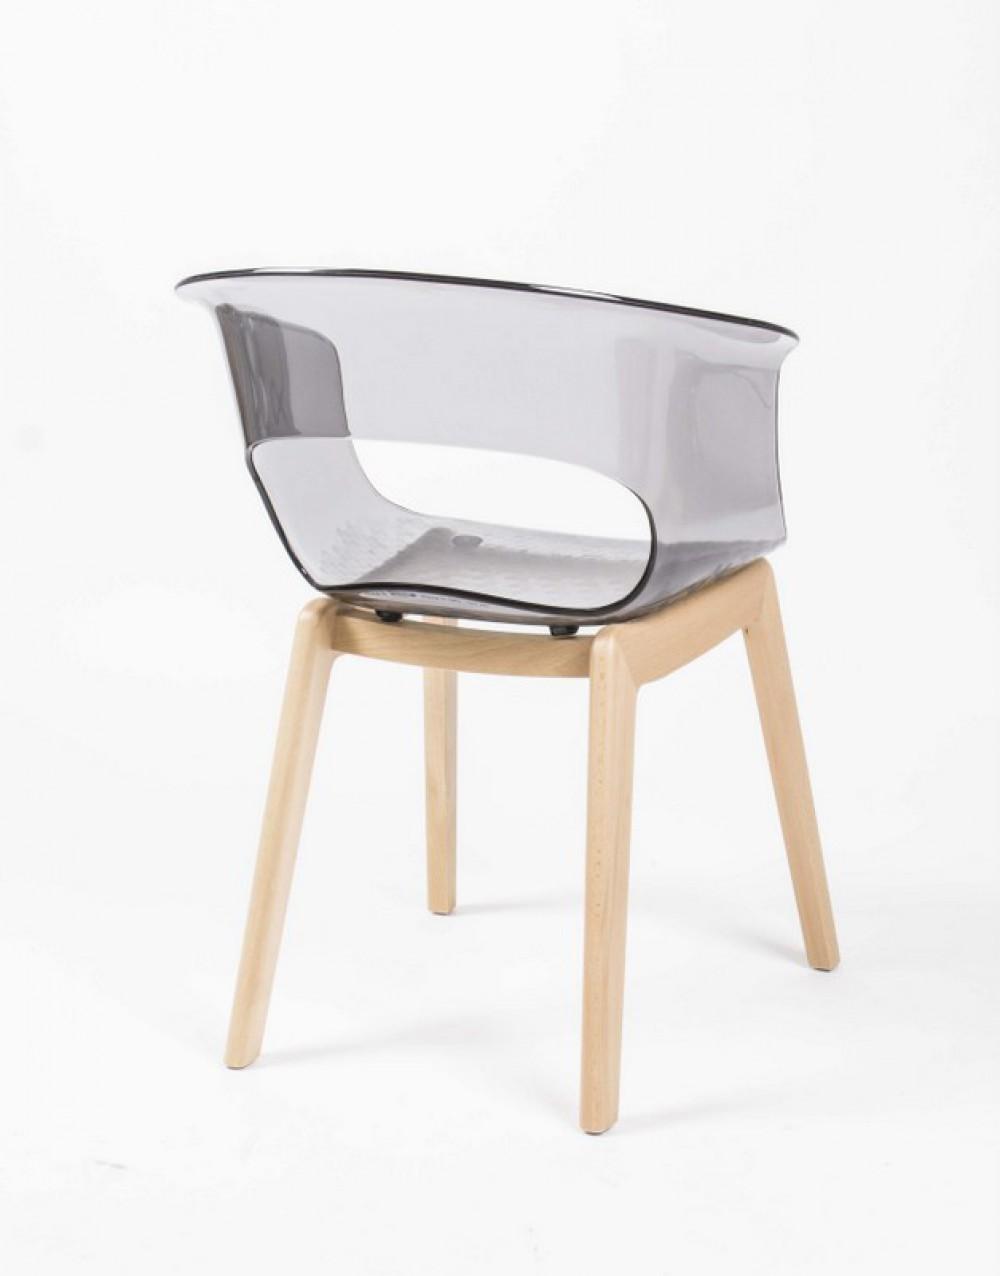 Design stuhl grau transparent stuhl mit armlehne for Design stuhl mit armlehne